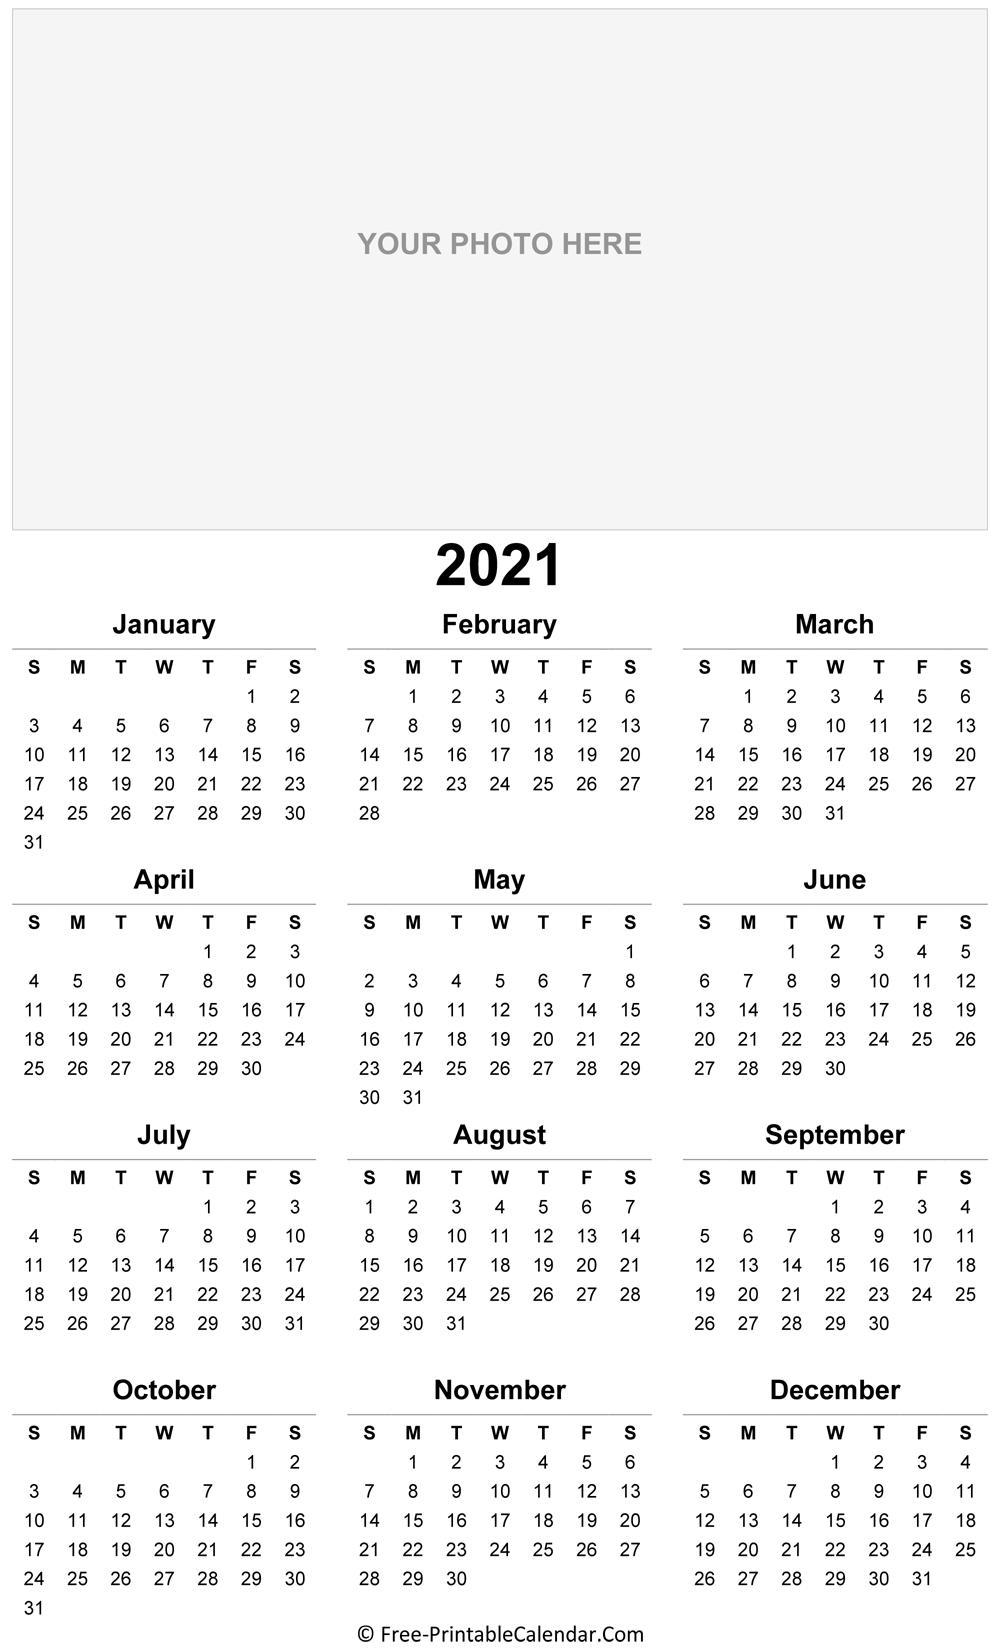 2021 Photo Calendar Templates pertaining to Microsoft Photo Calender 2021 Graphics